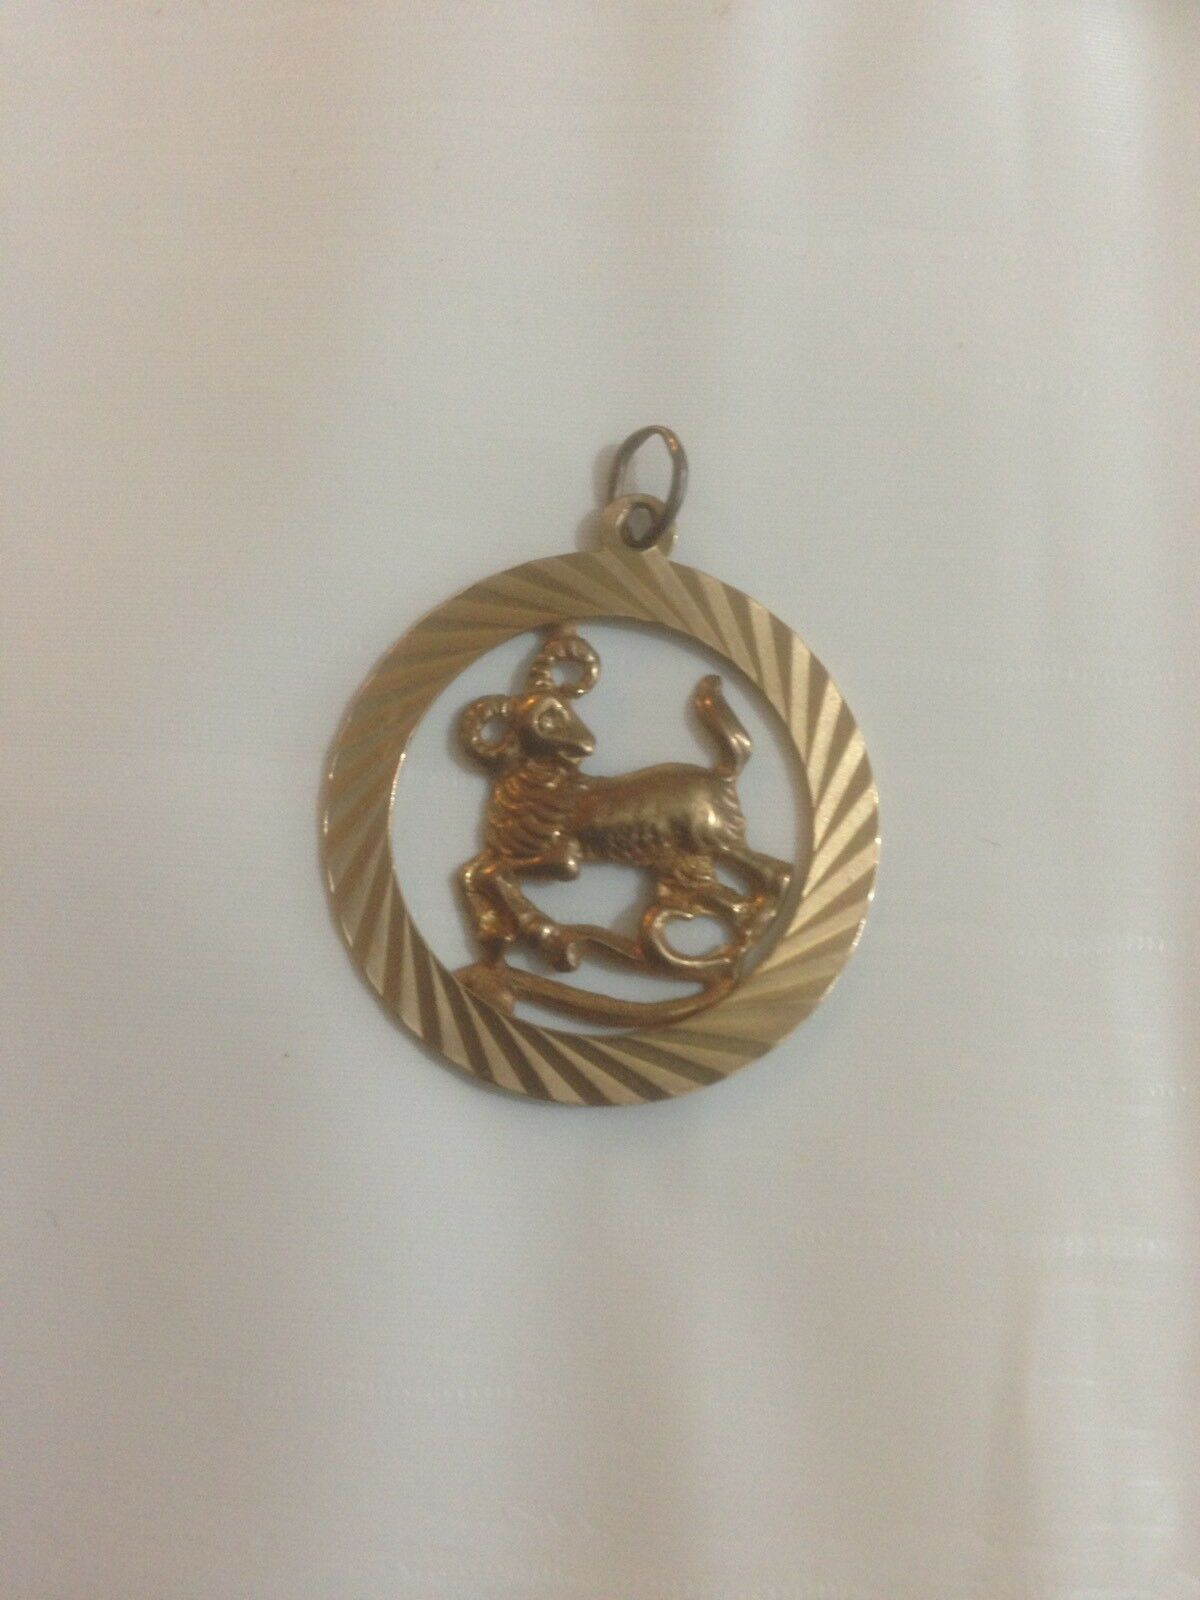 Splendido 9ct Solid Solid Solid oro Ciondolo vittoriano 5deebb